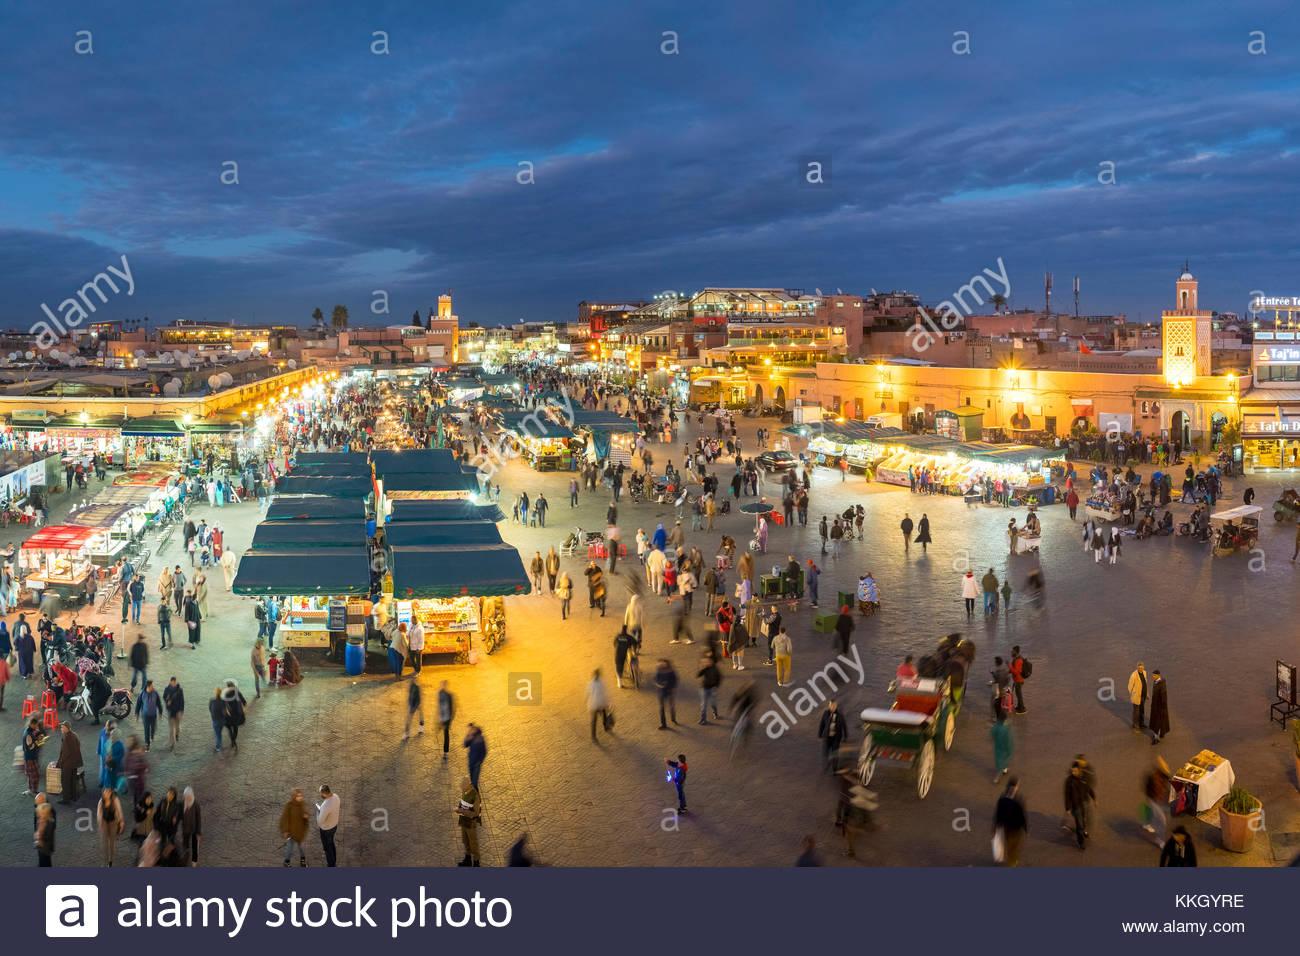 Marokko, Marrakech-Safi (Marrakesh-Tensift-El Haouz) Region, Marrakesch. Djemaa El-Fná Square in der Abenddämmerung. Stockbild